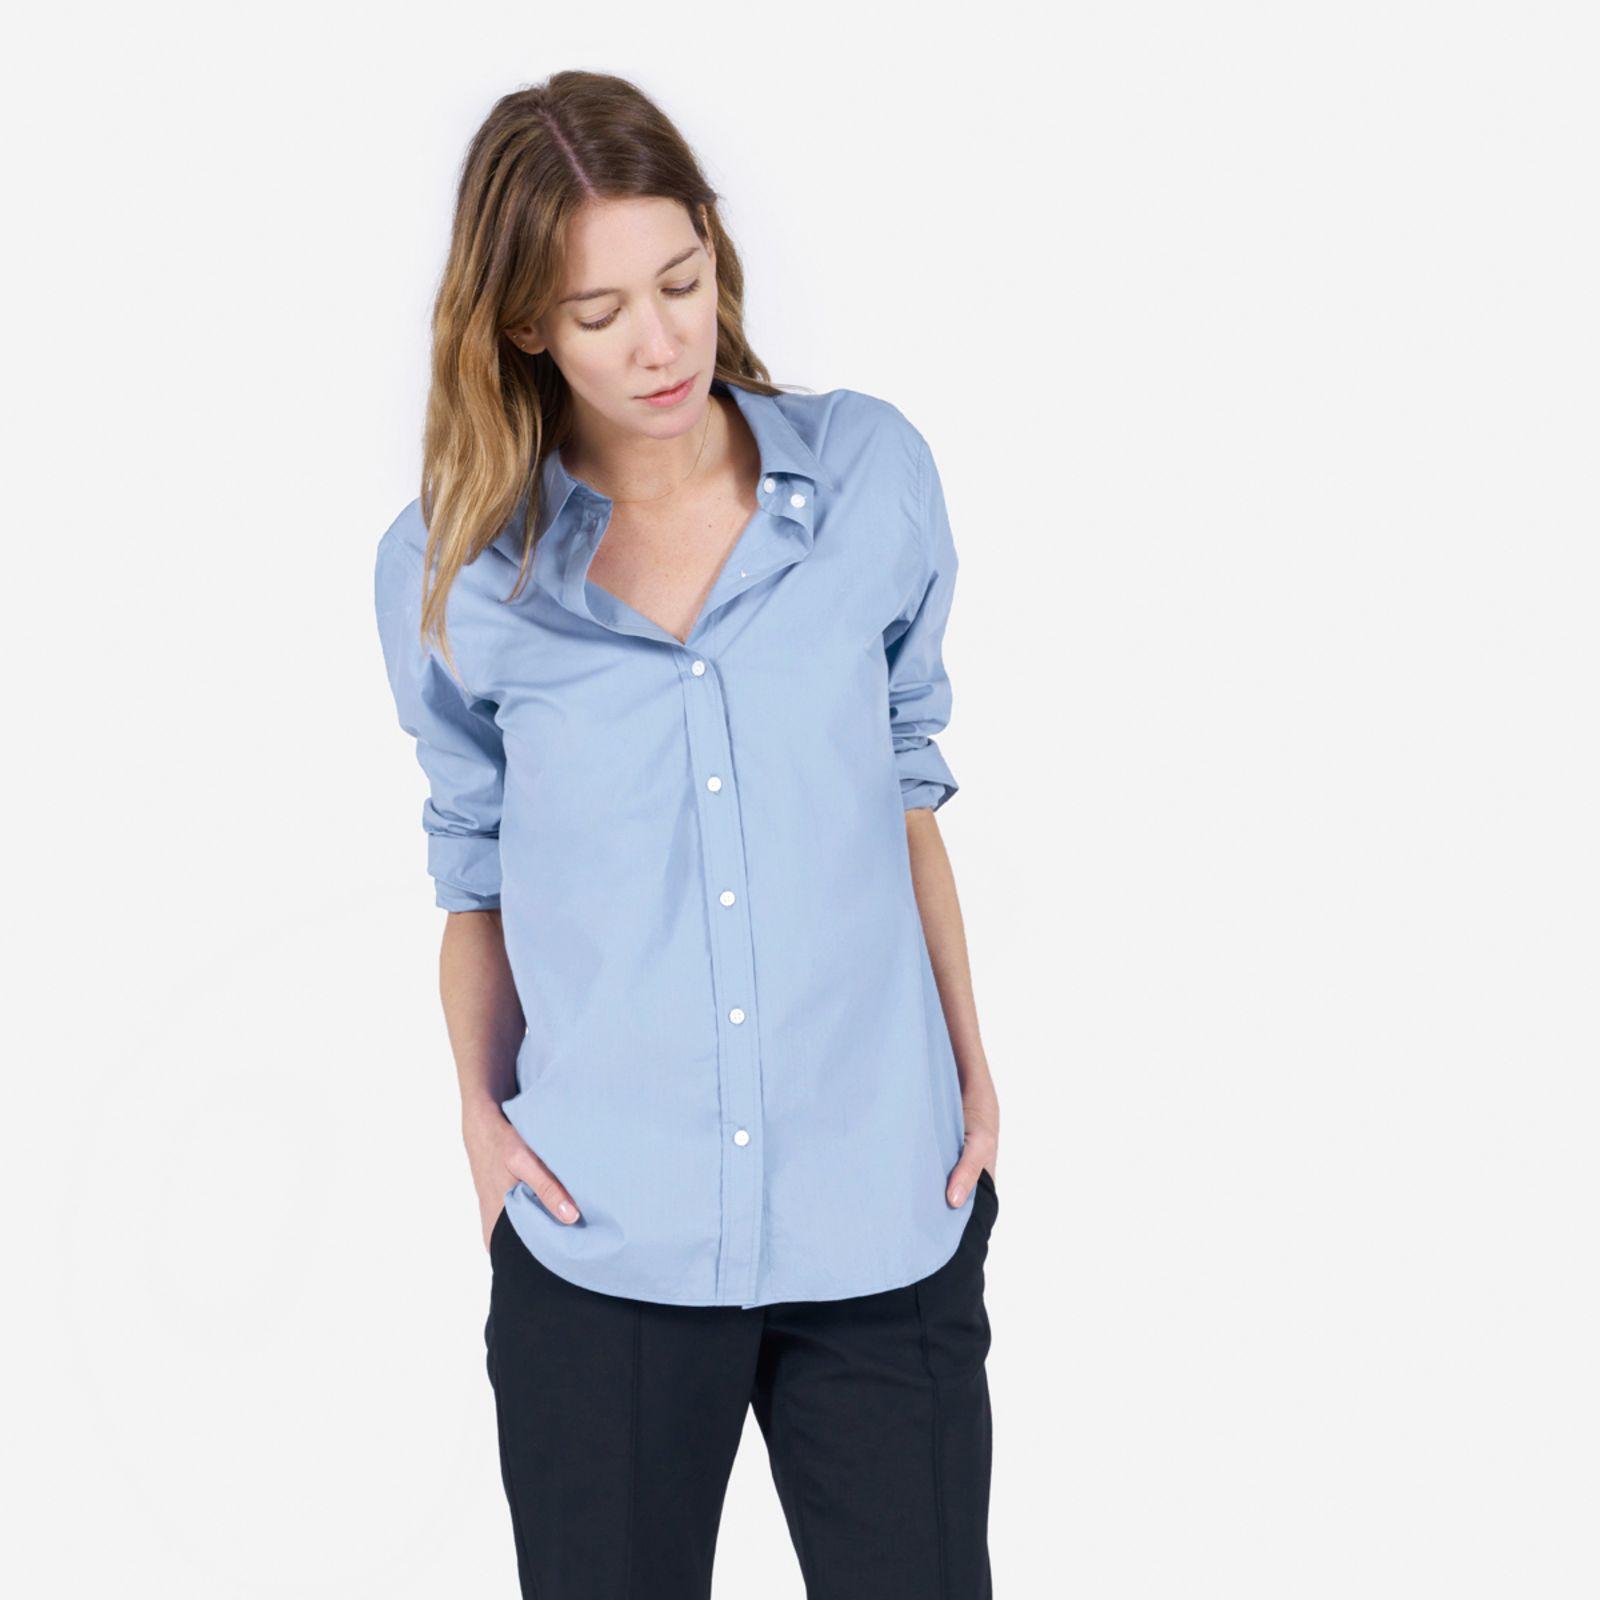 women's relaxed poplin shirt by everlane in light blue, size 12